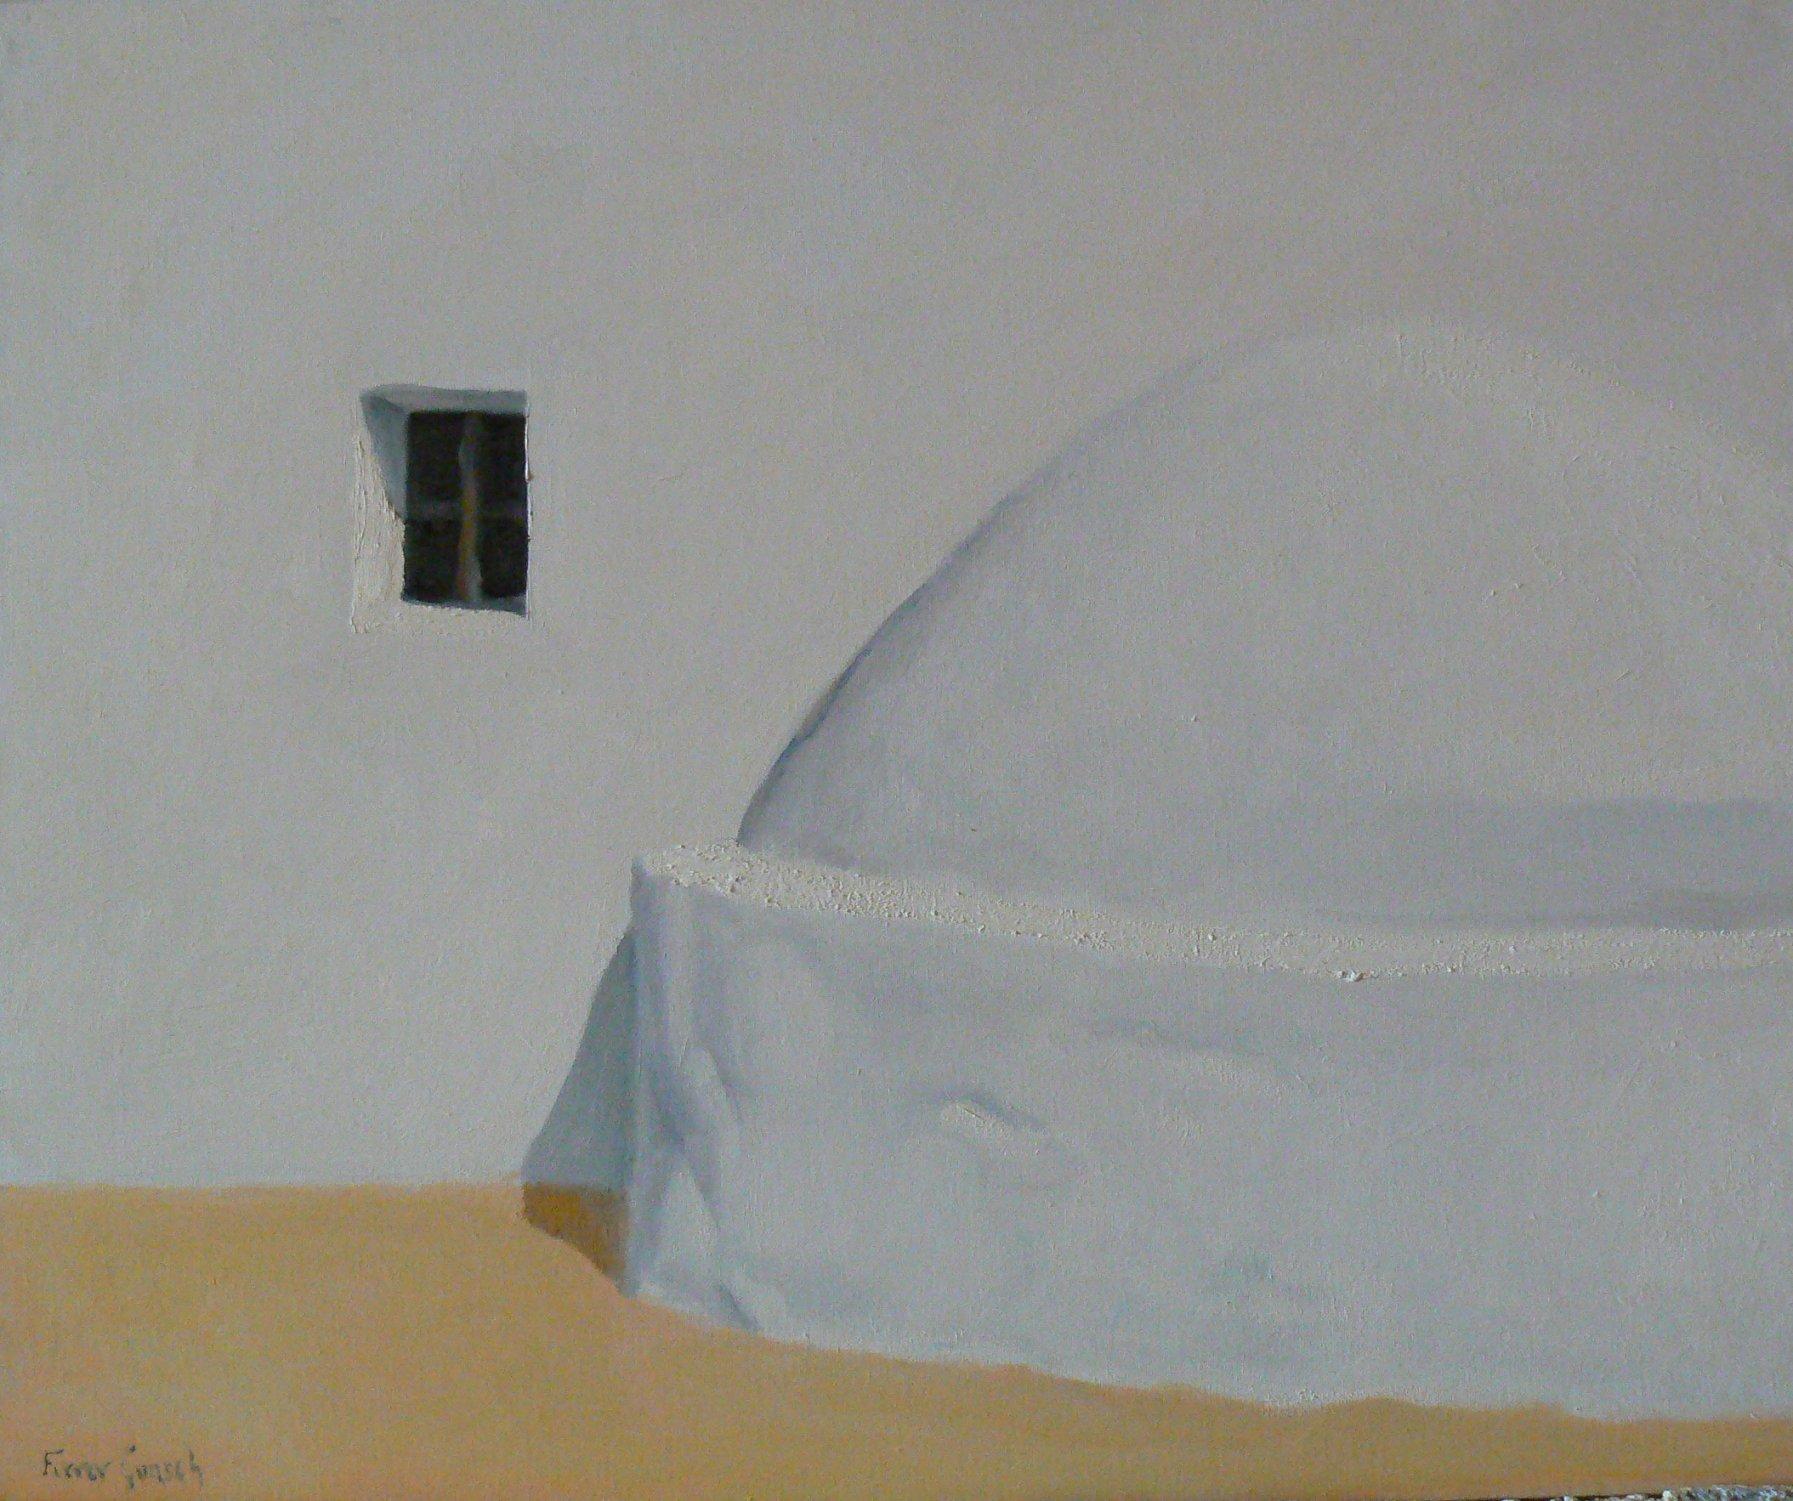 Forn, Ibiza (1990) - Vicent Ferrer Guasch